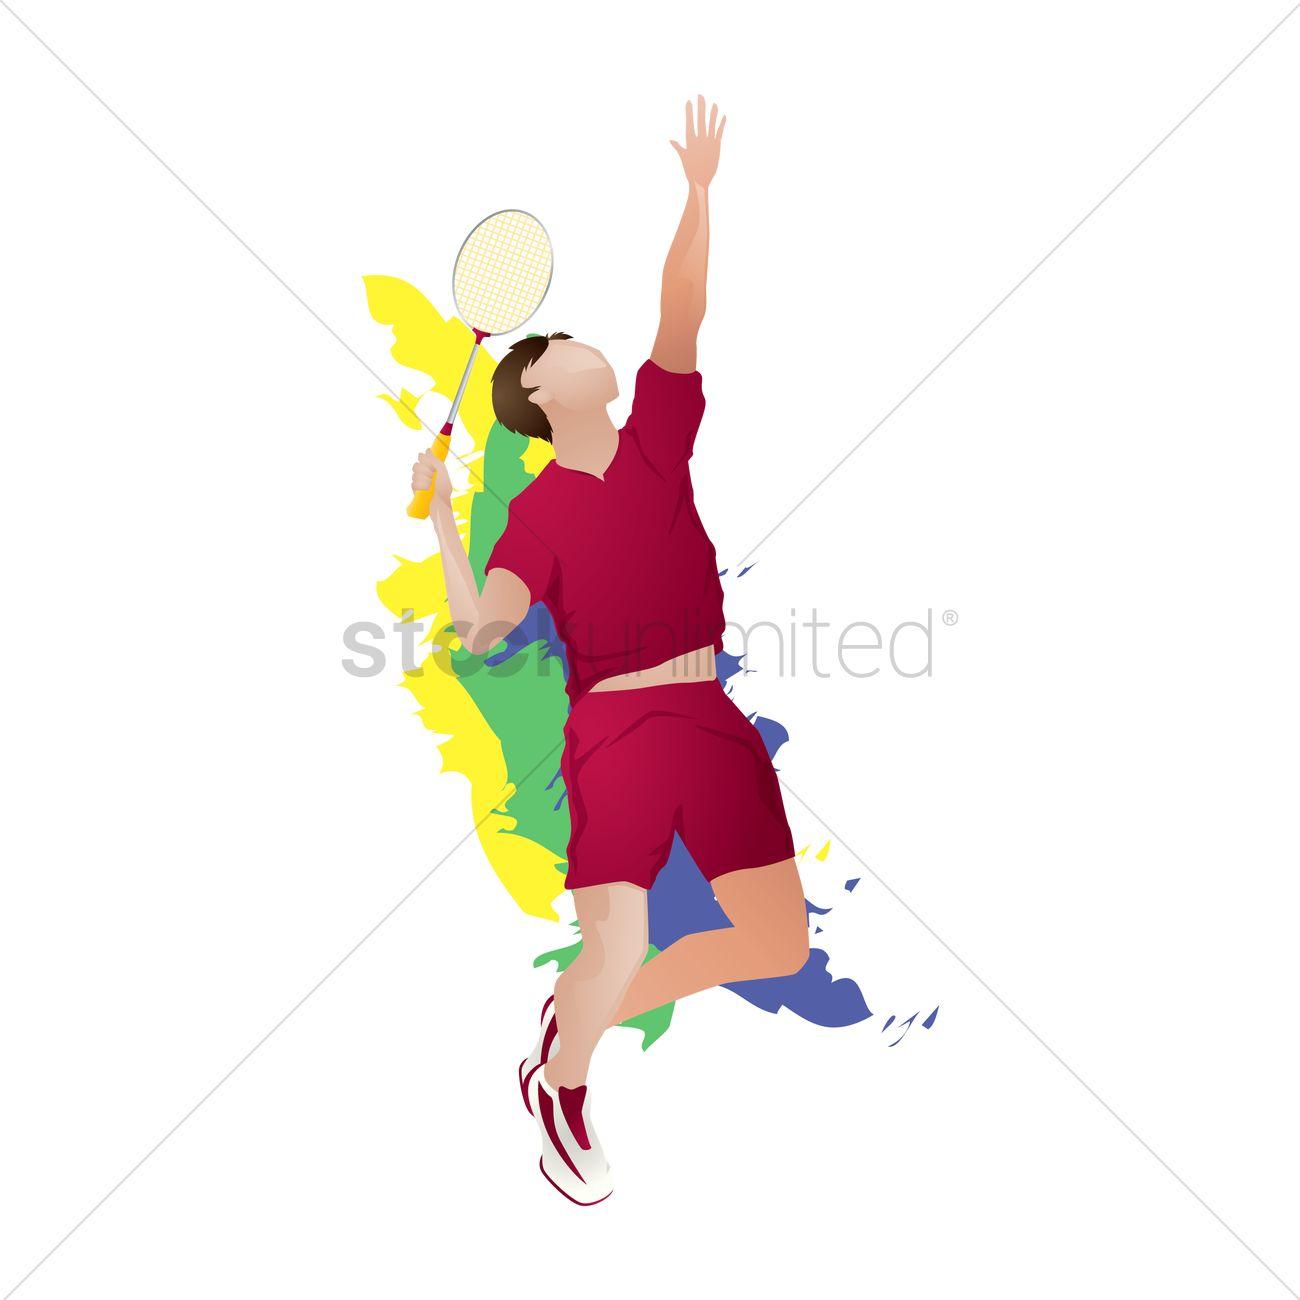 Badminton player in action Vector Image.